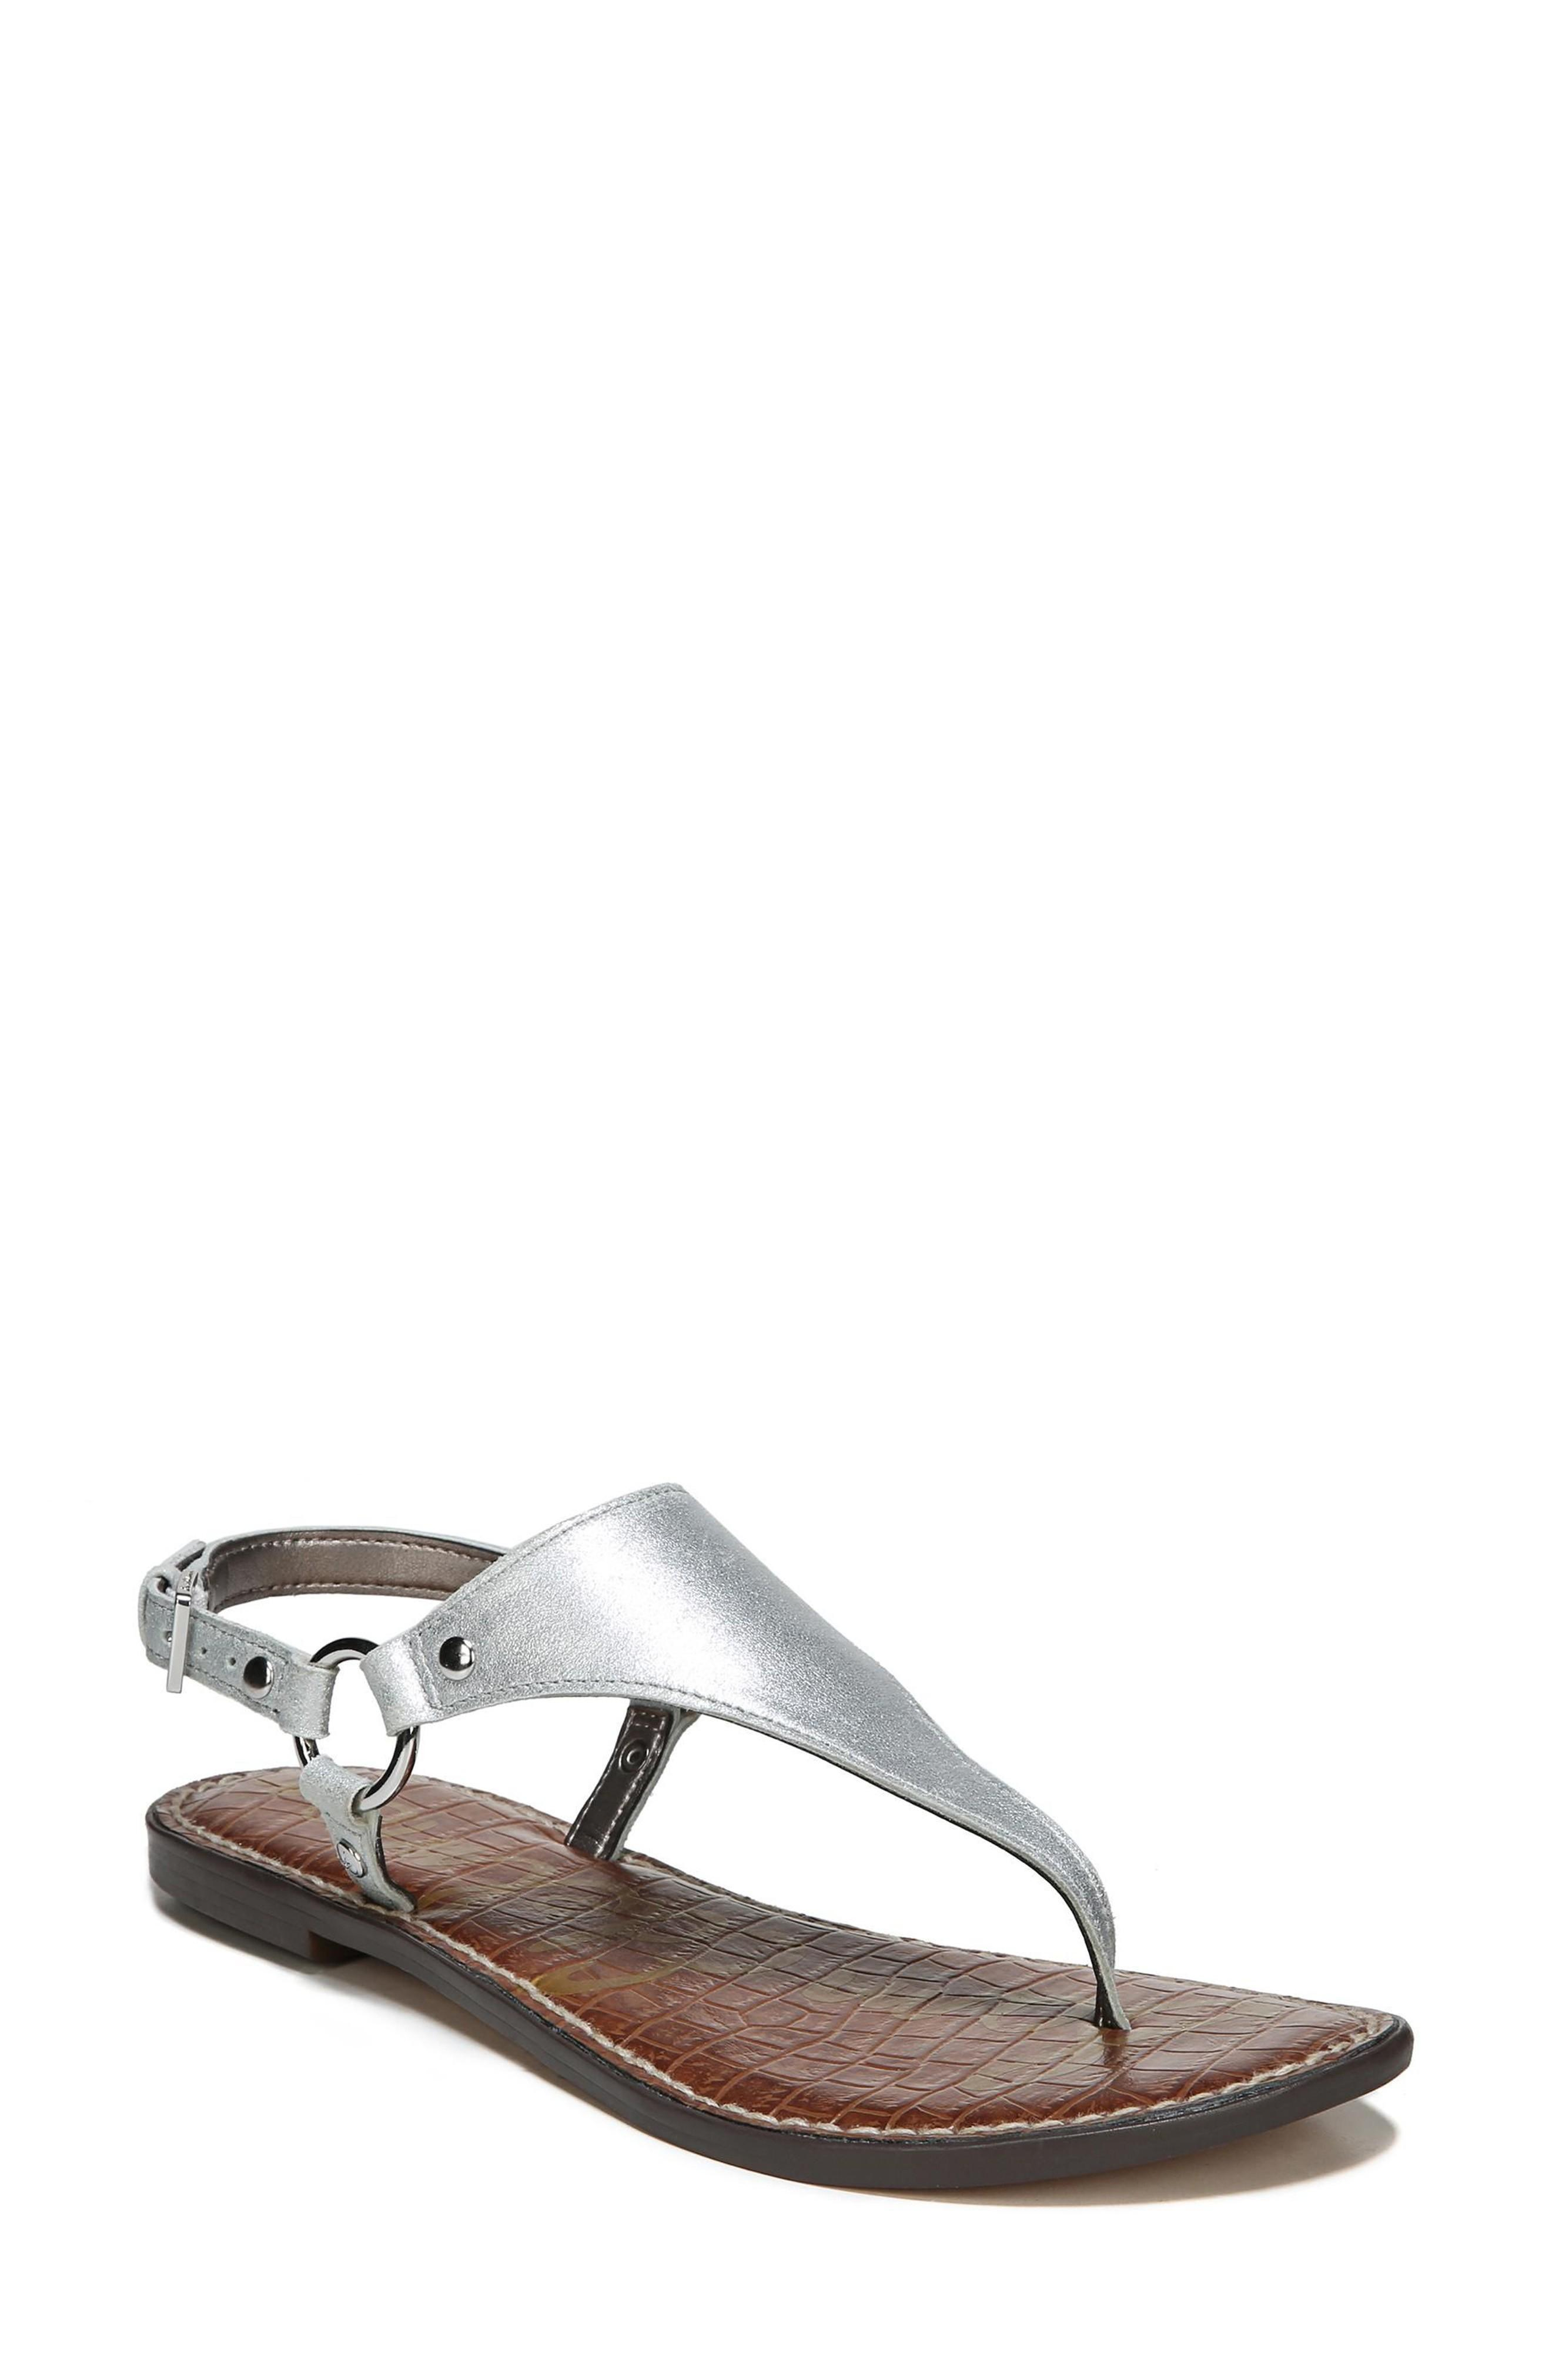 ffa93de96ec4 Sam Edelman Greta Sandal In Silver Leather